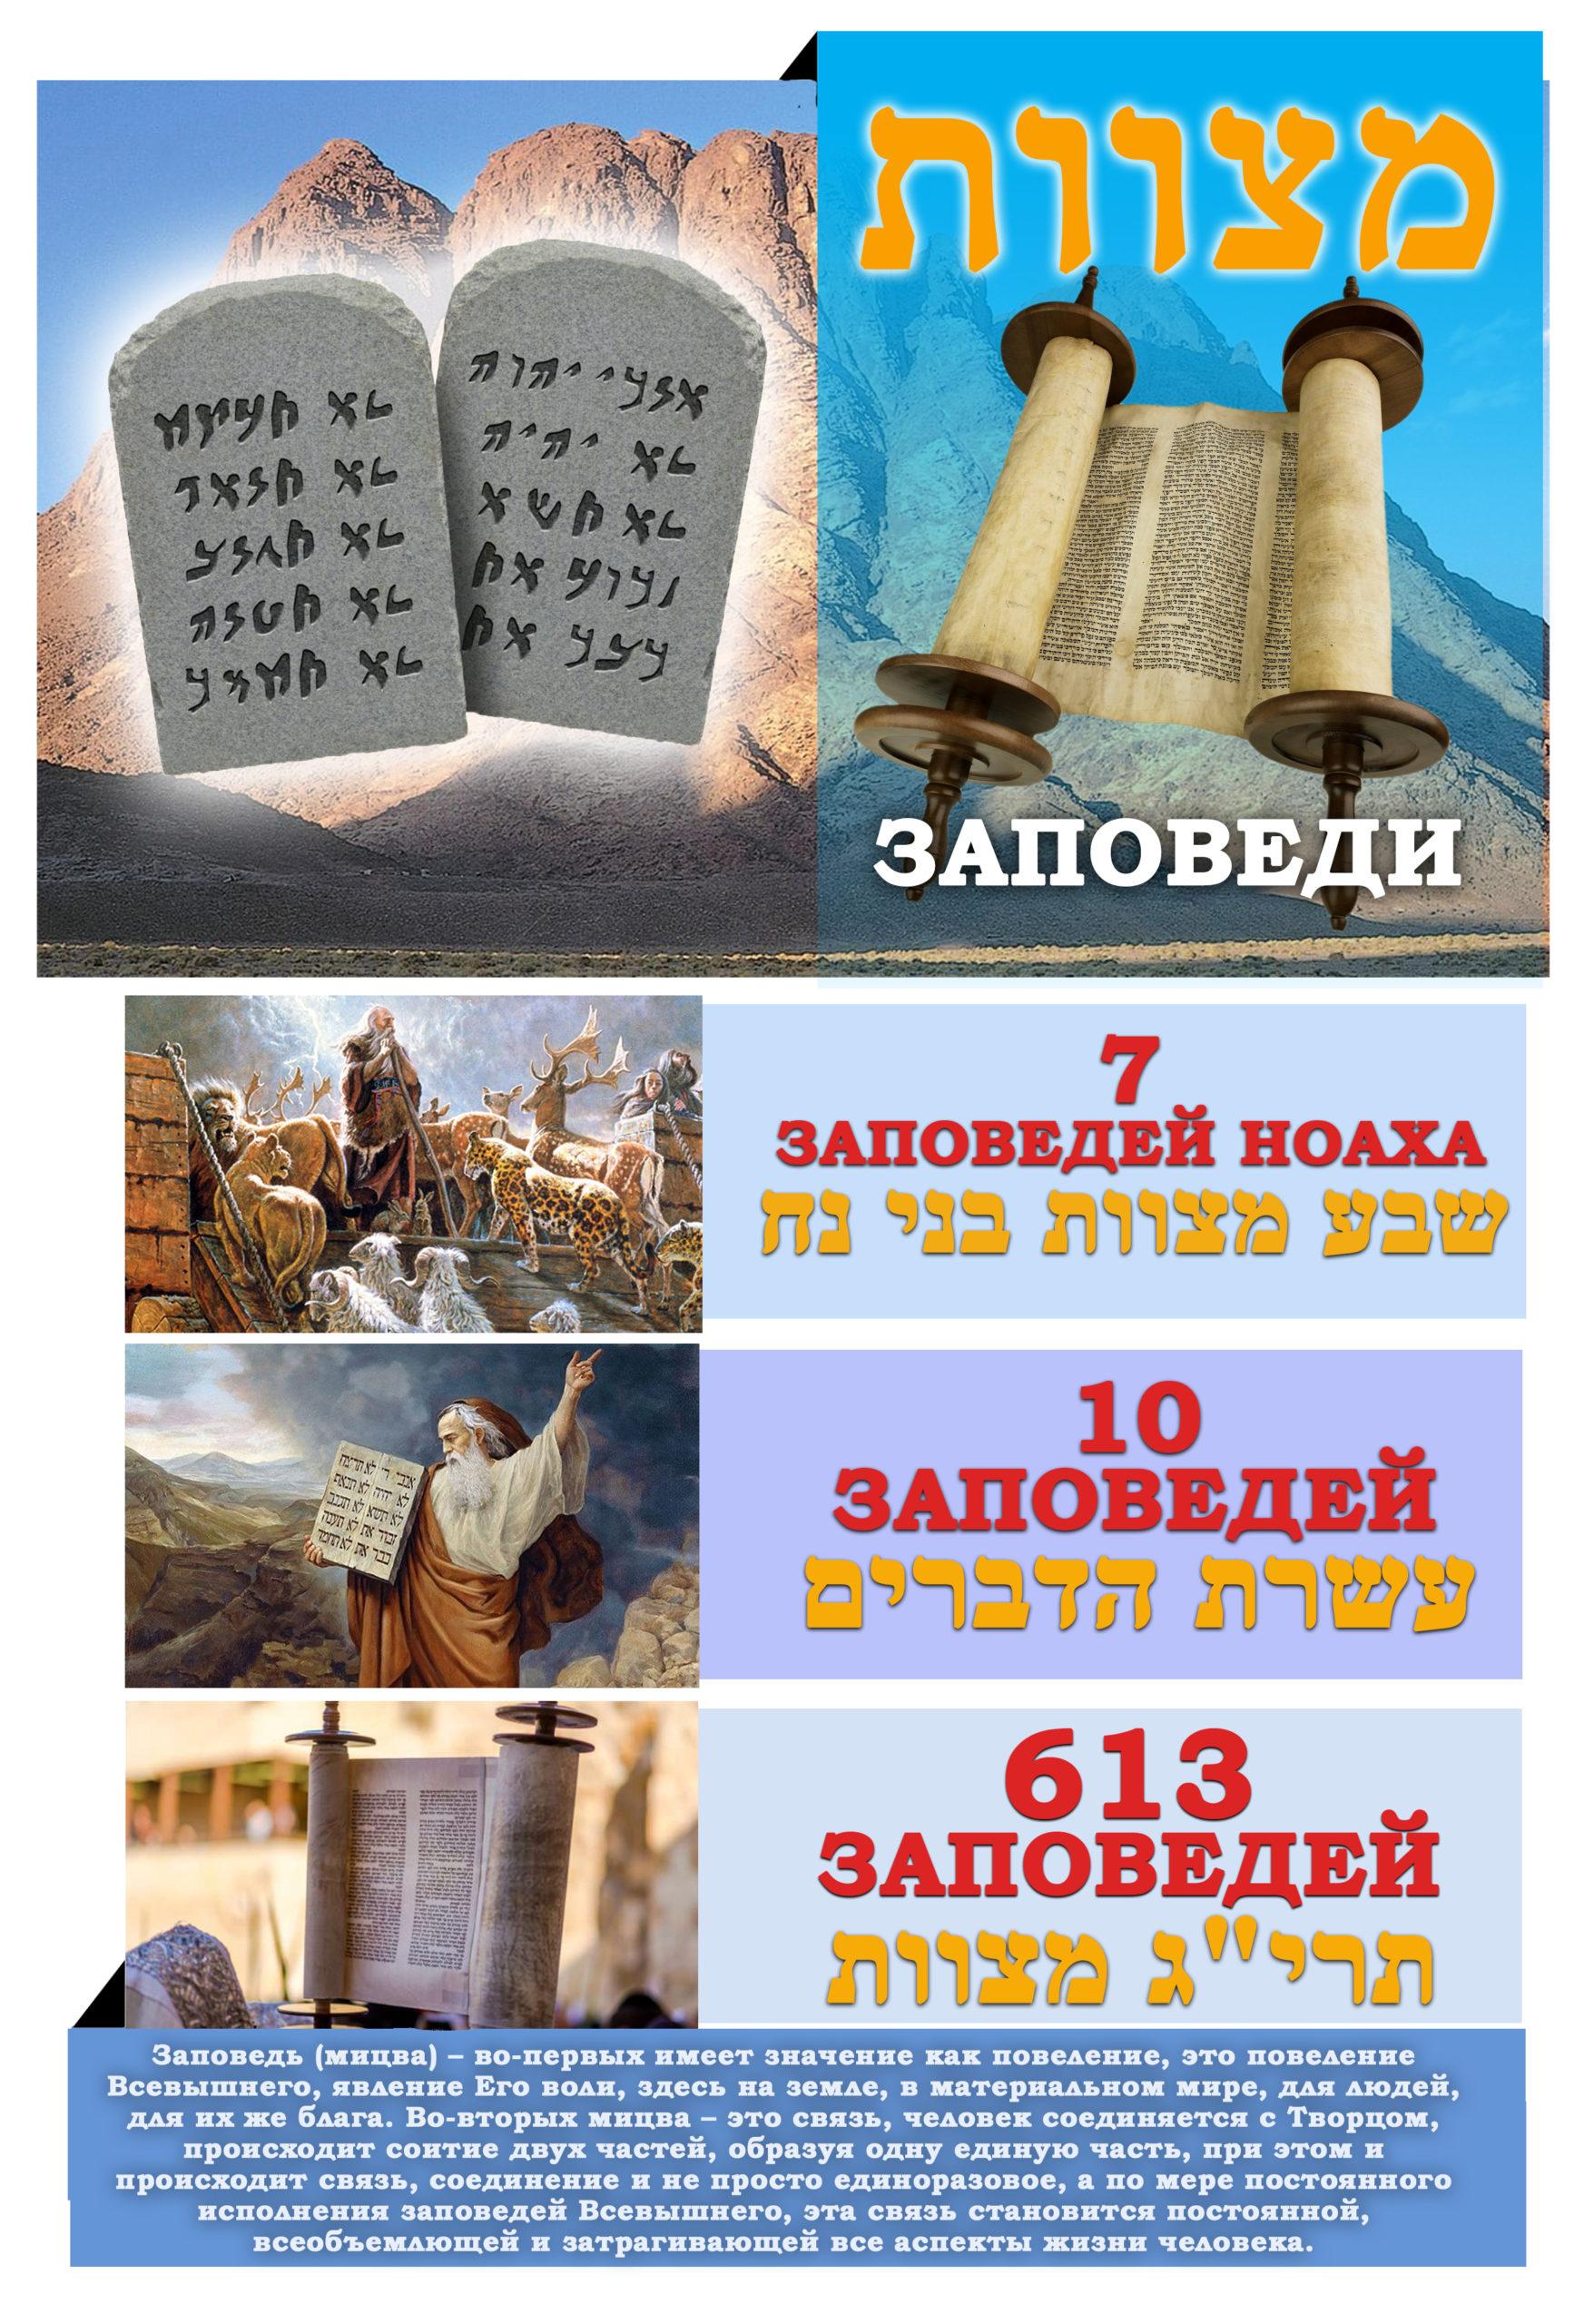 Заповеди - Дерех Хаим - Сергей Лемешаев